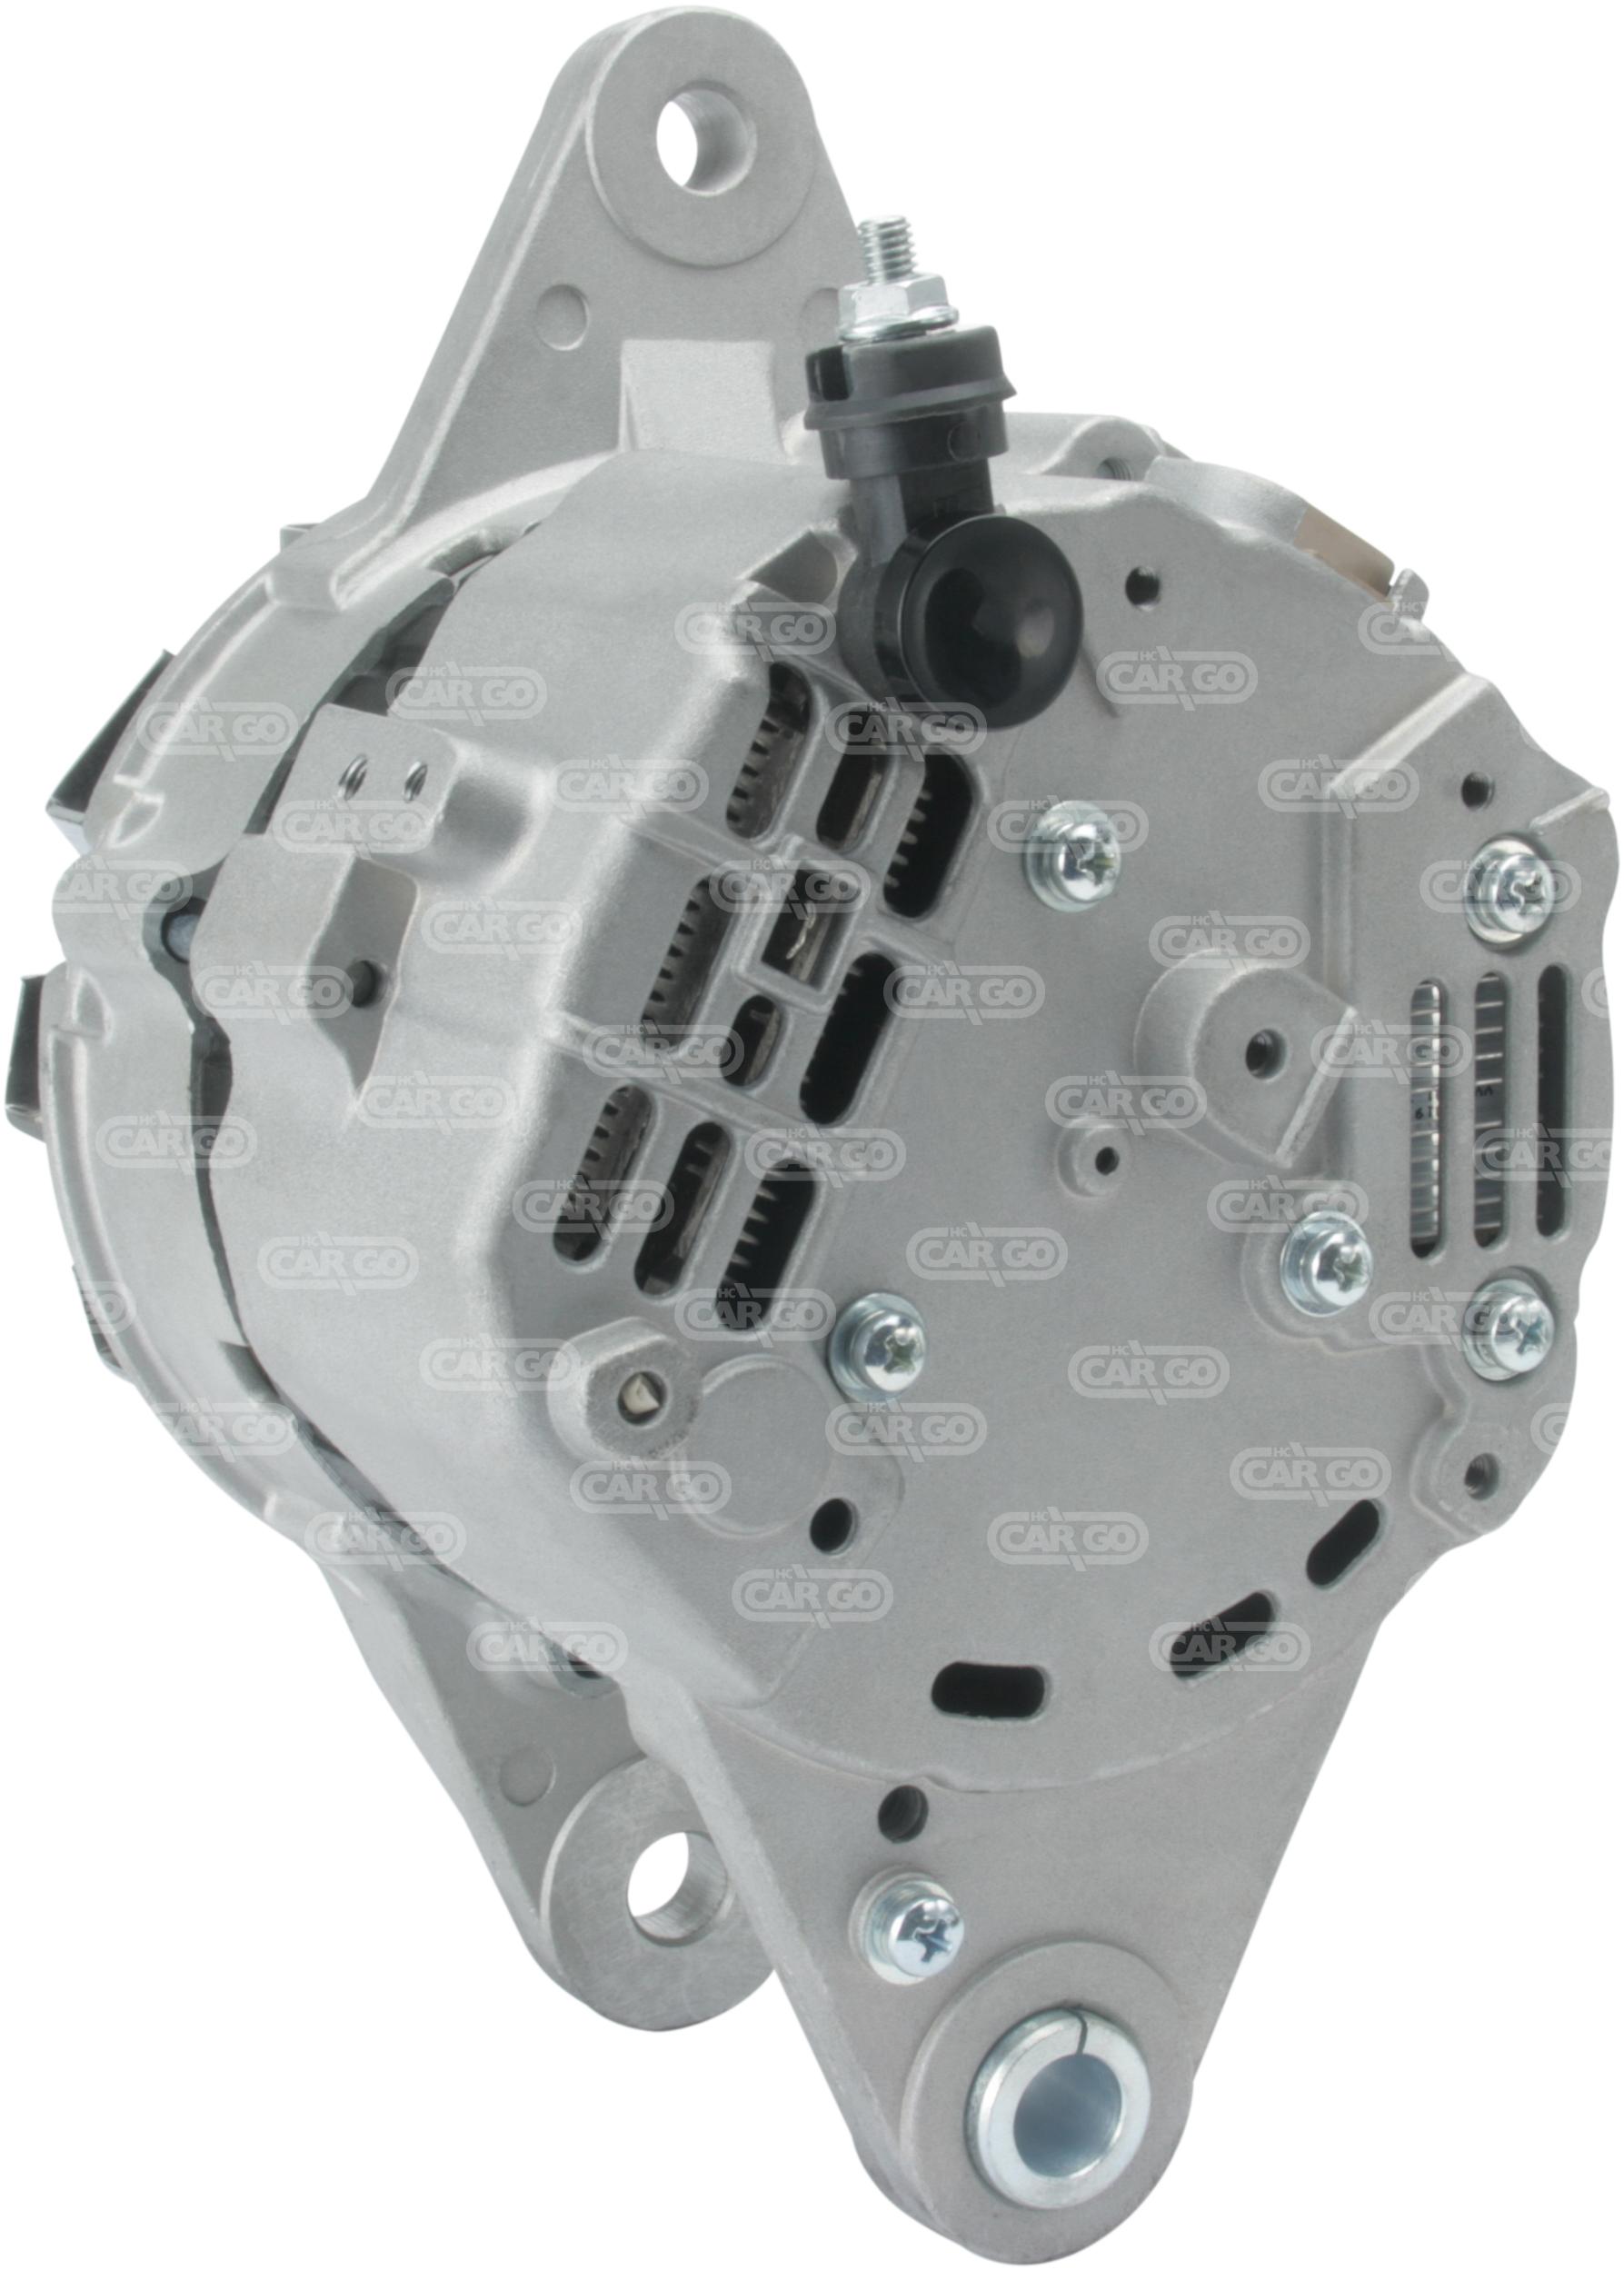 Alternateur 886 Voltage28 Amp50